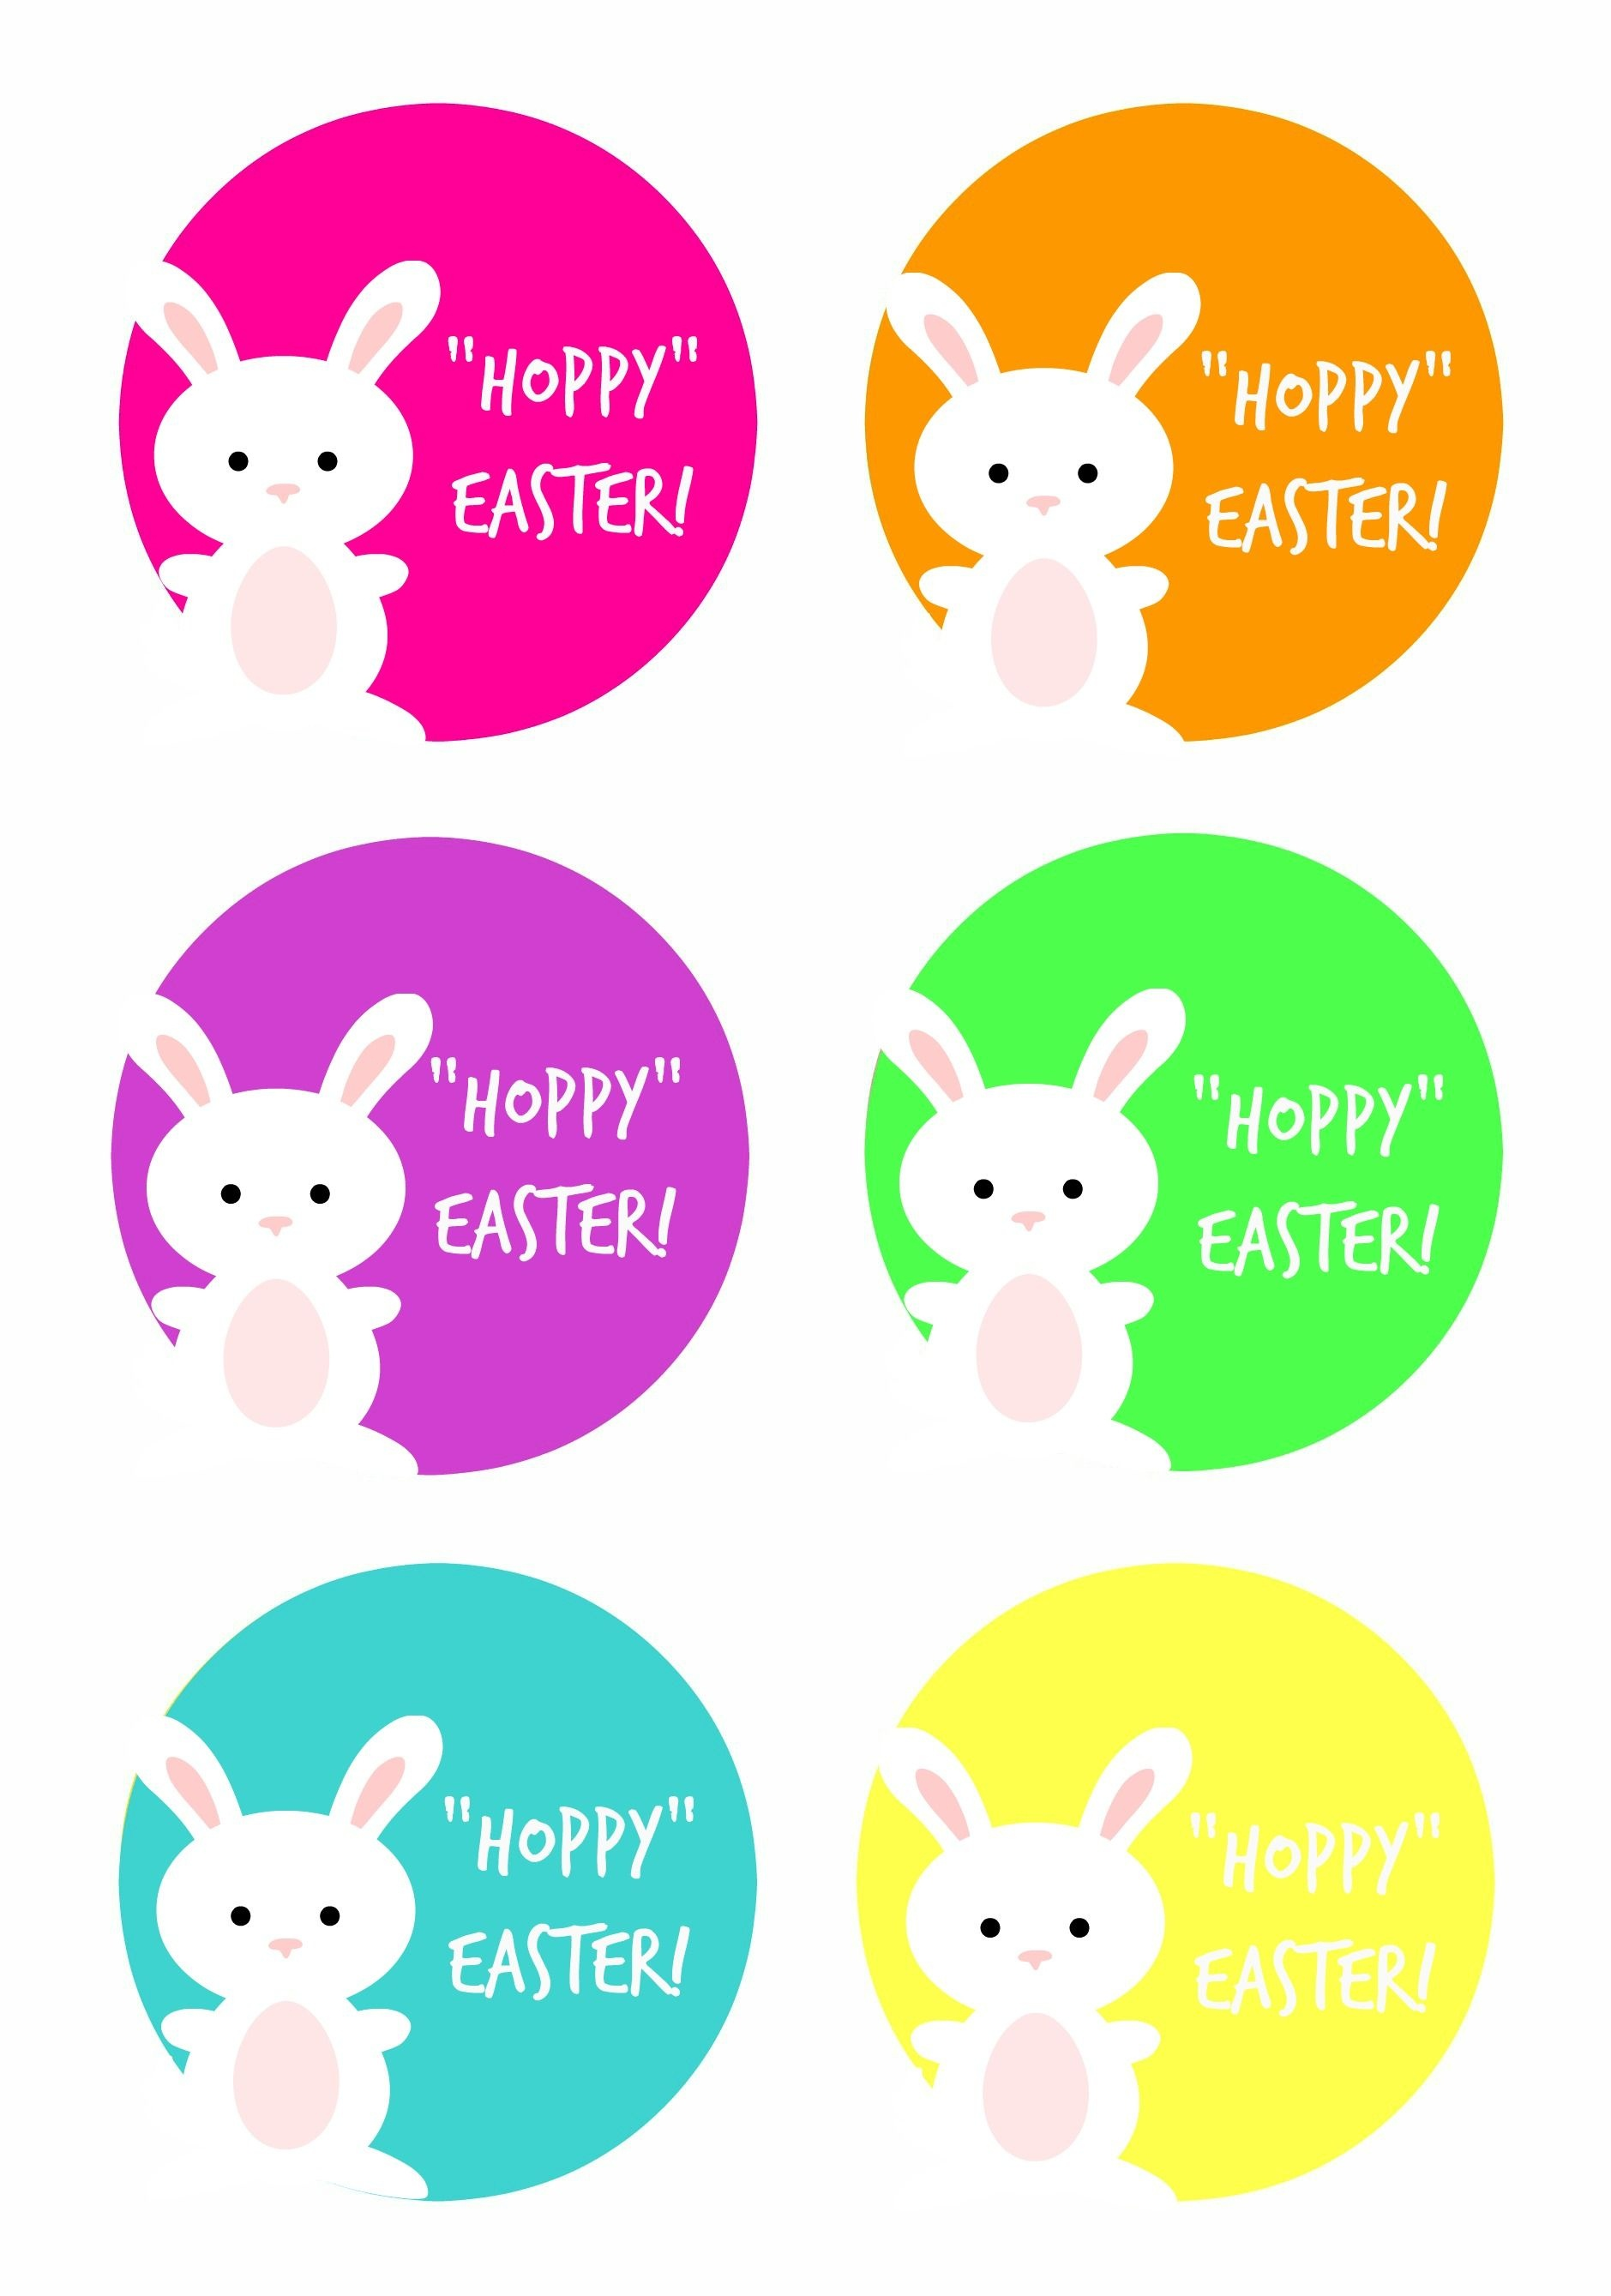 Free Easter Gift Tag Printable | Free Printables! | Gift Tags - Free Printable Easter Tags